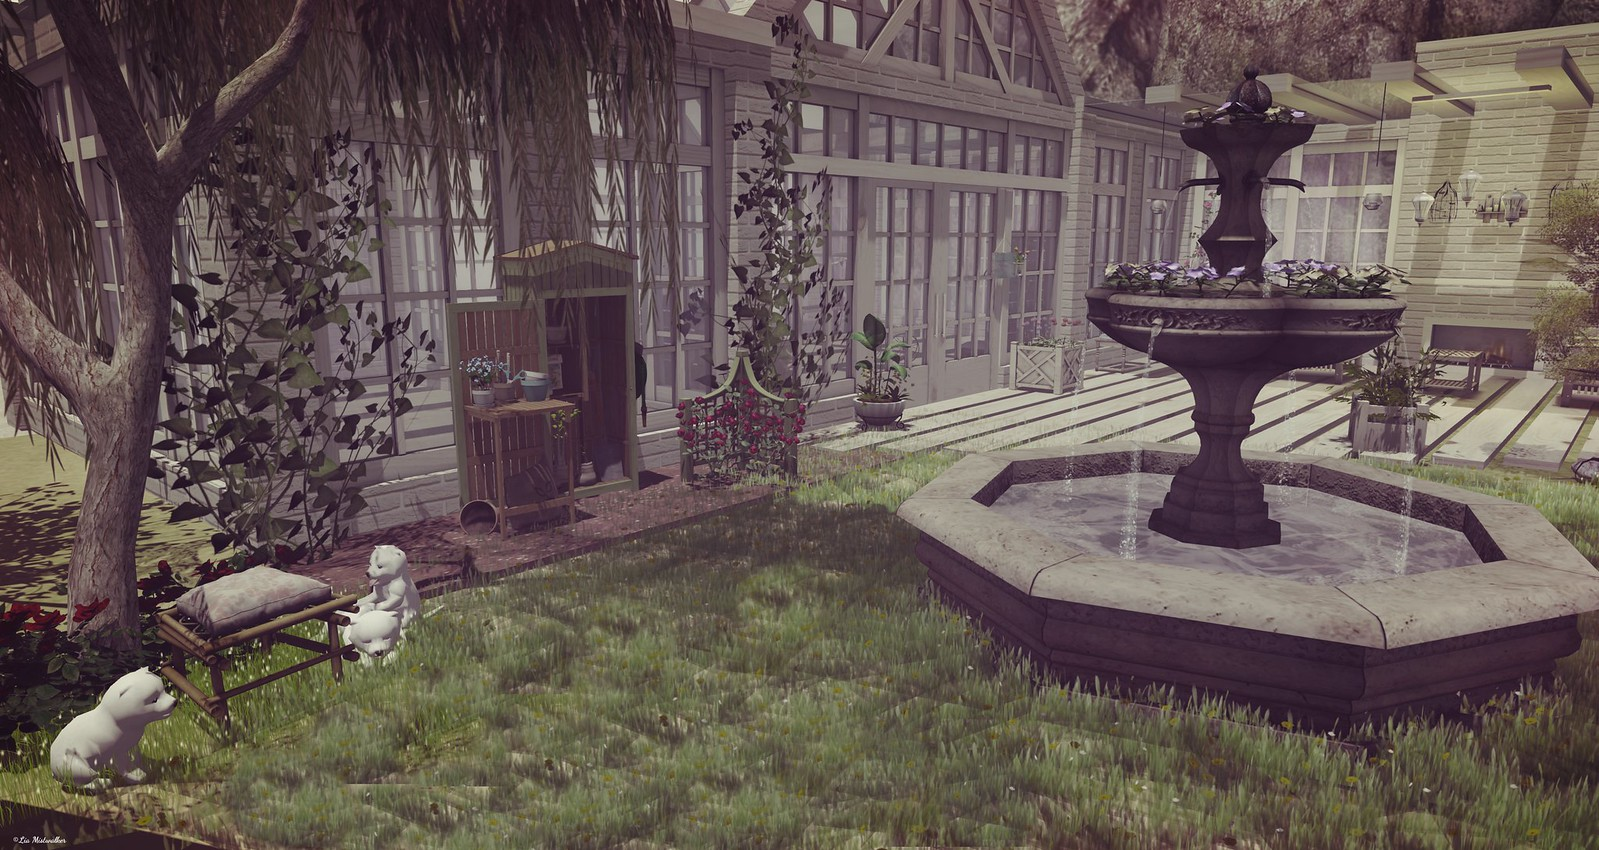 Home & Garden Therapy # 253